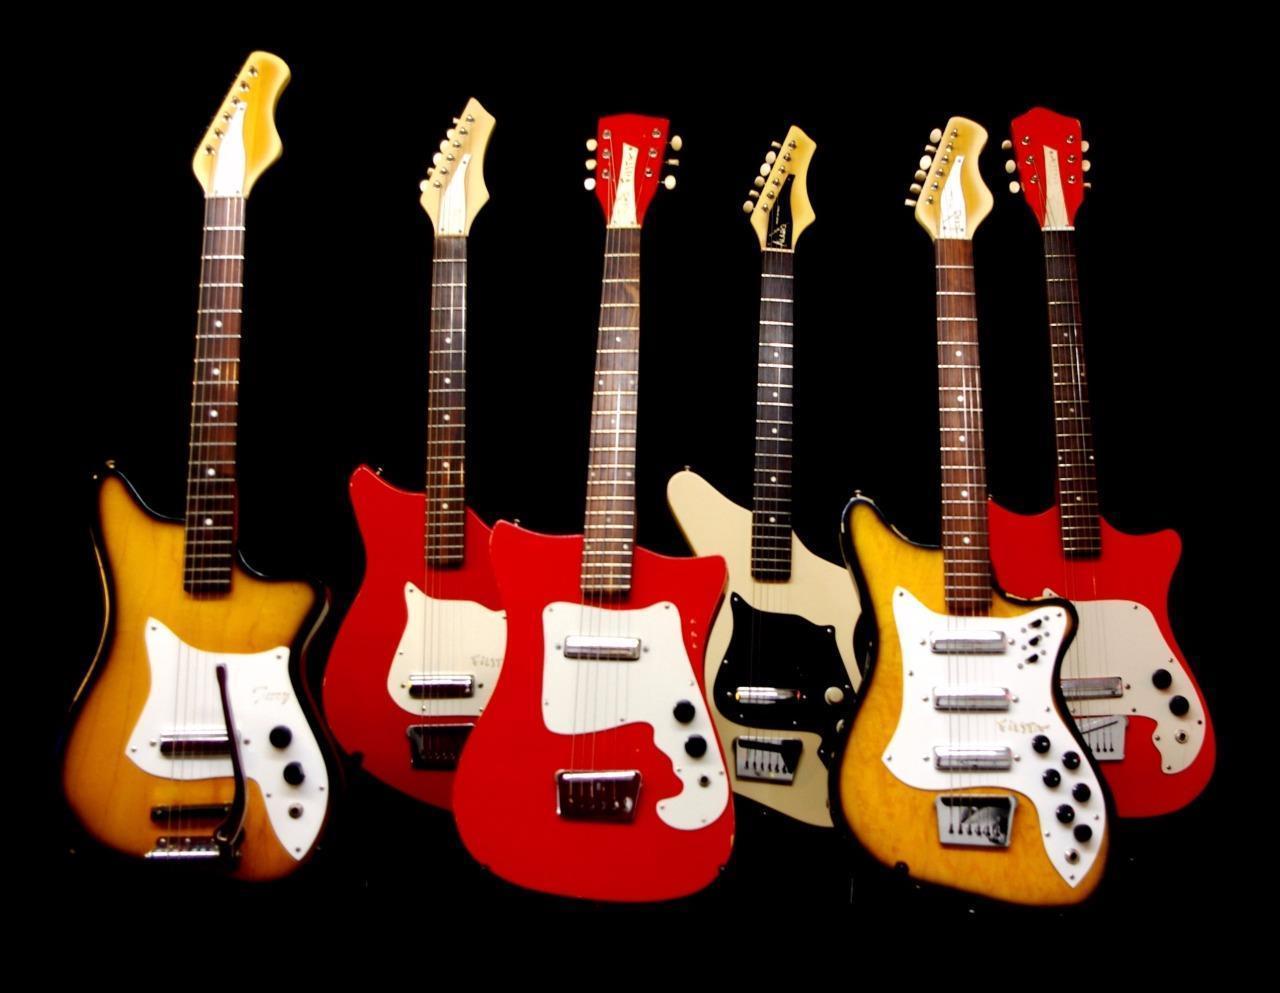 Alamo Vintage Electric Guitar Collection, Fiesta, Fury